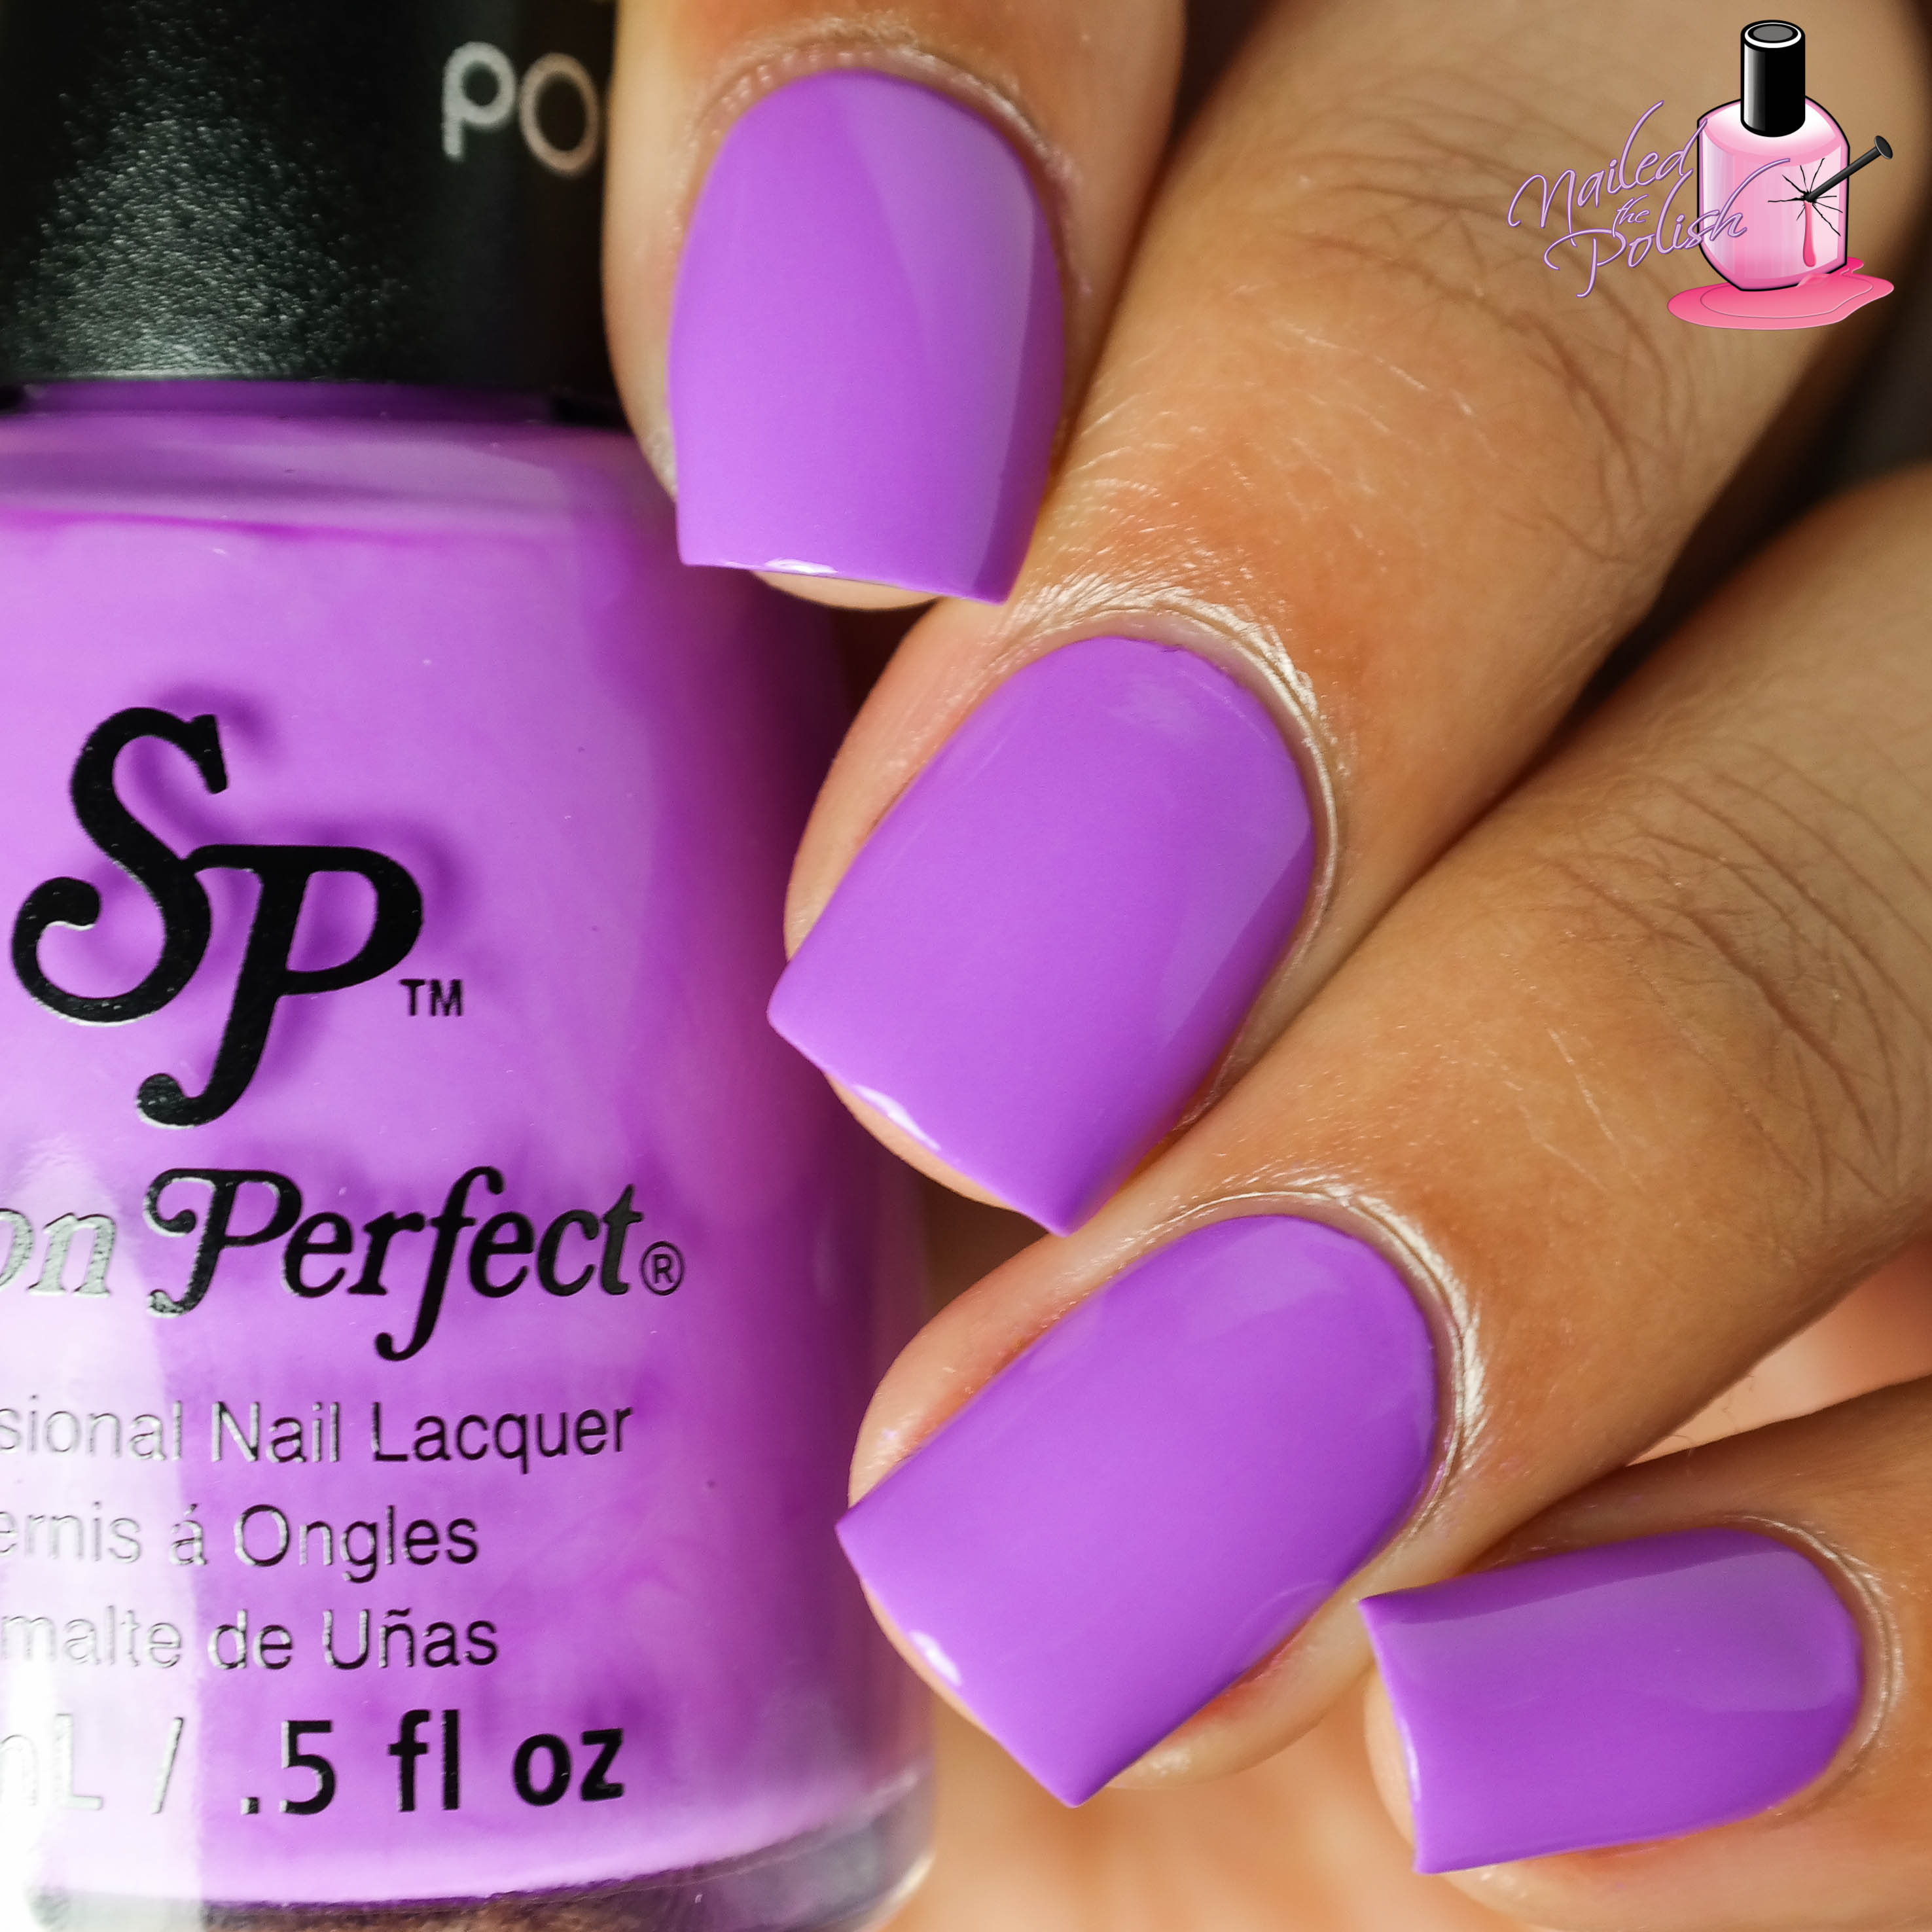 Salon Perfect Neon Pop! Collection | nailedthepolish